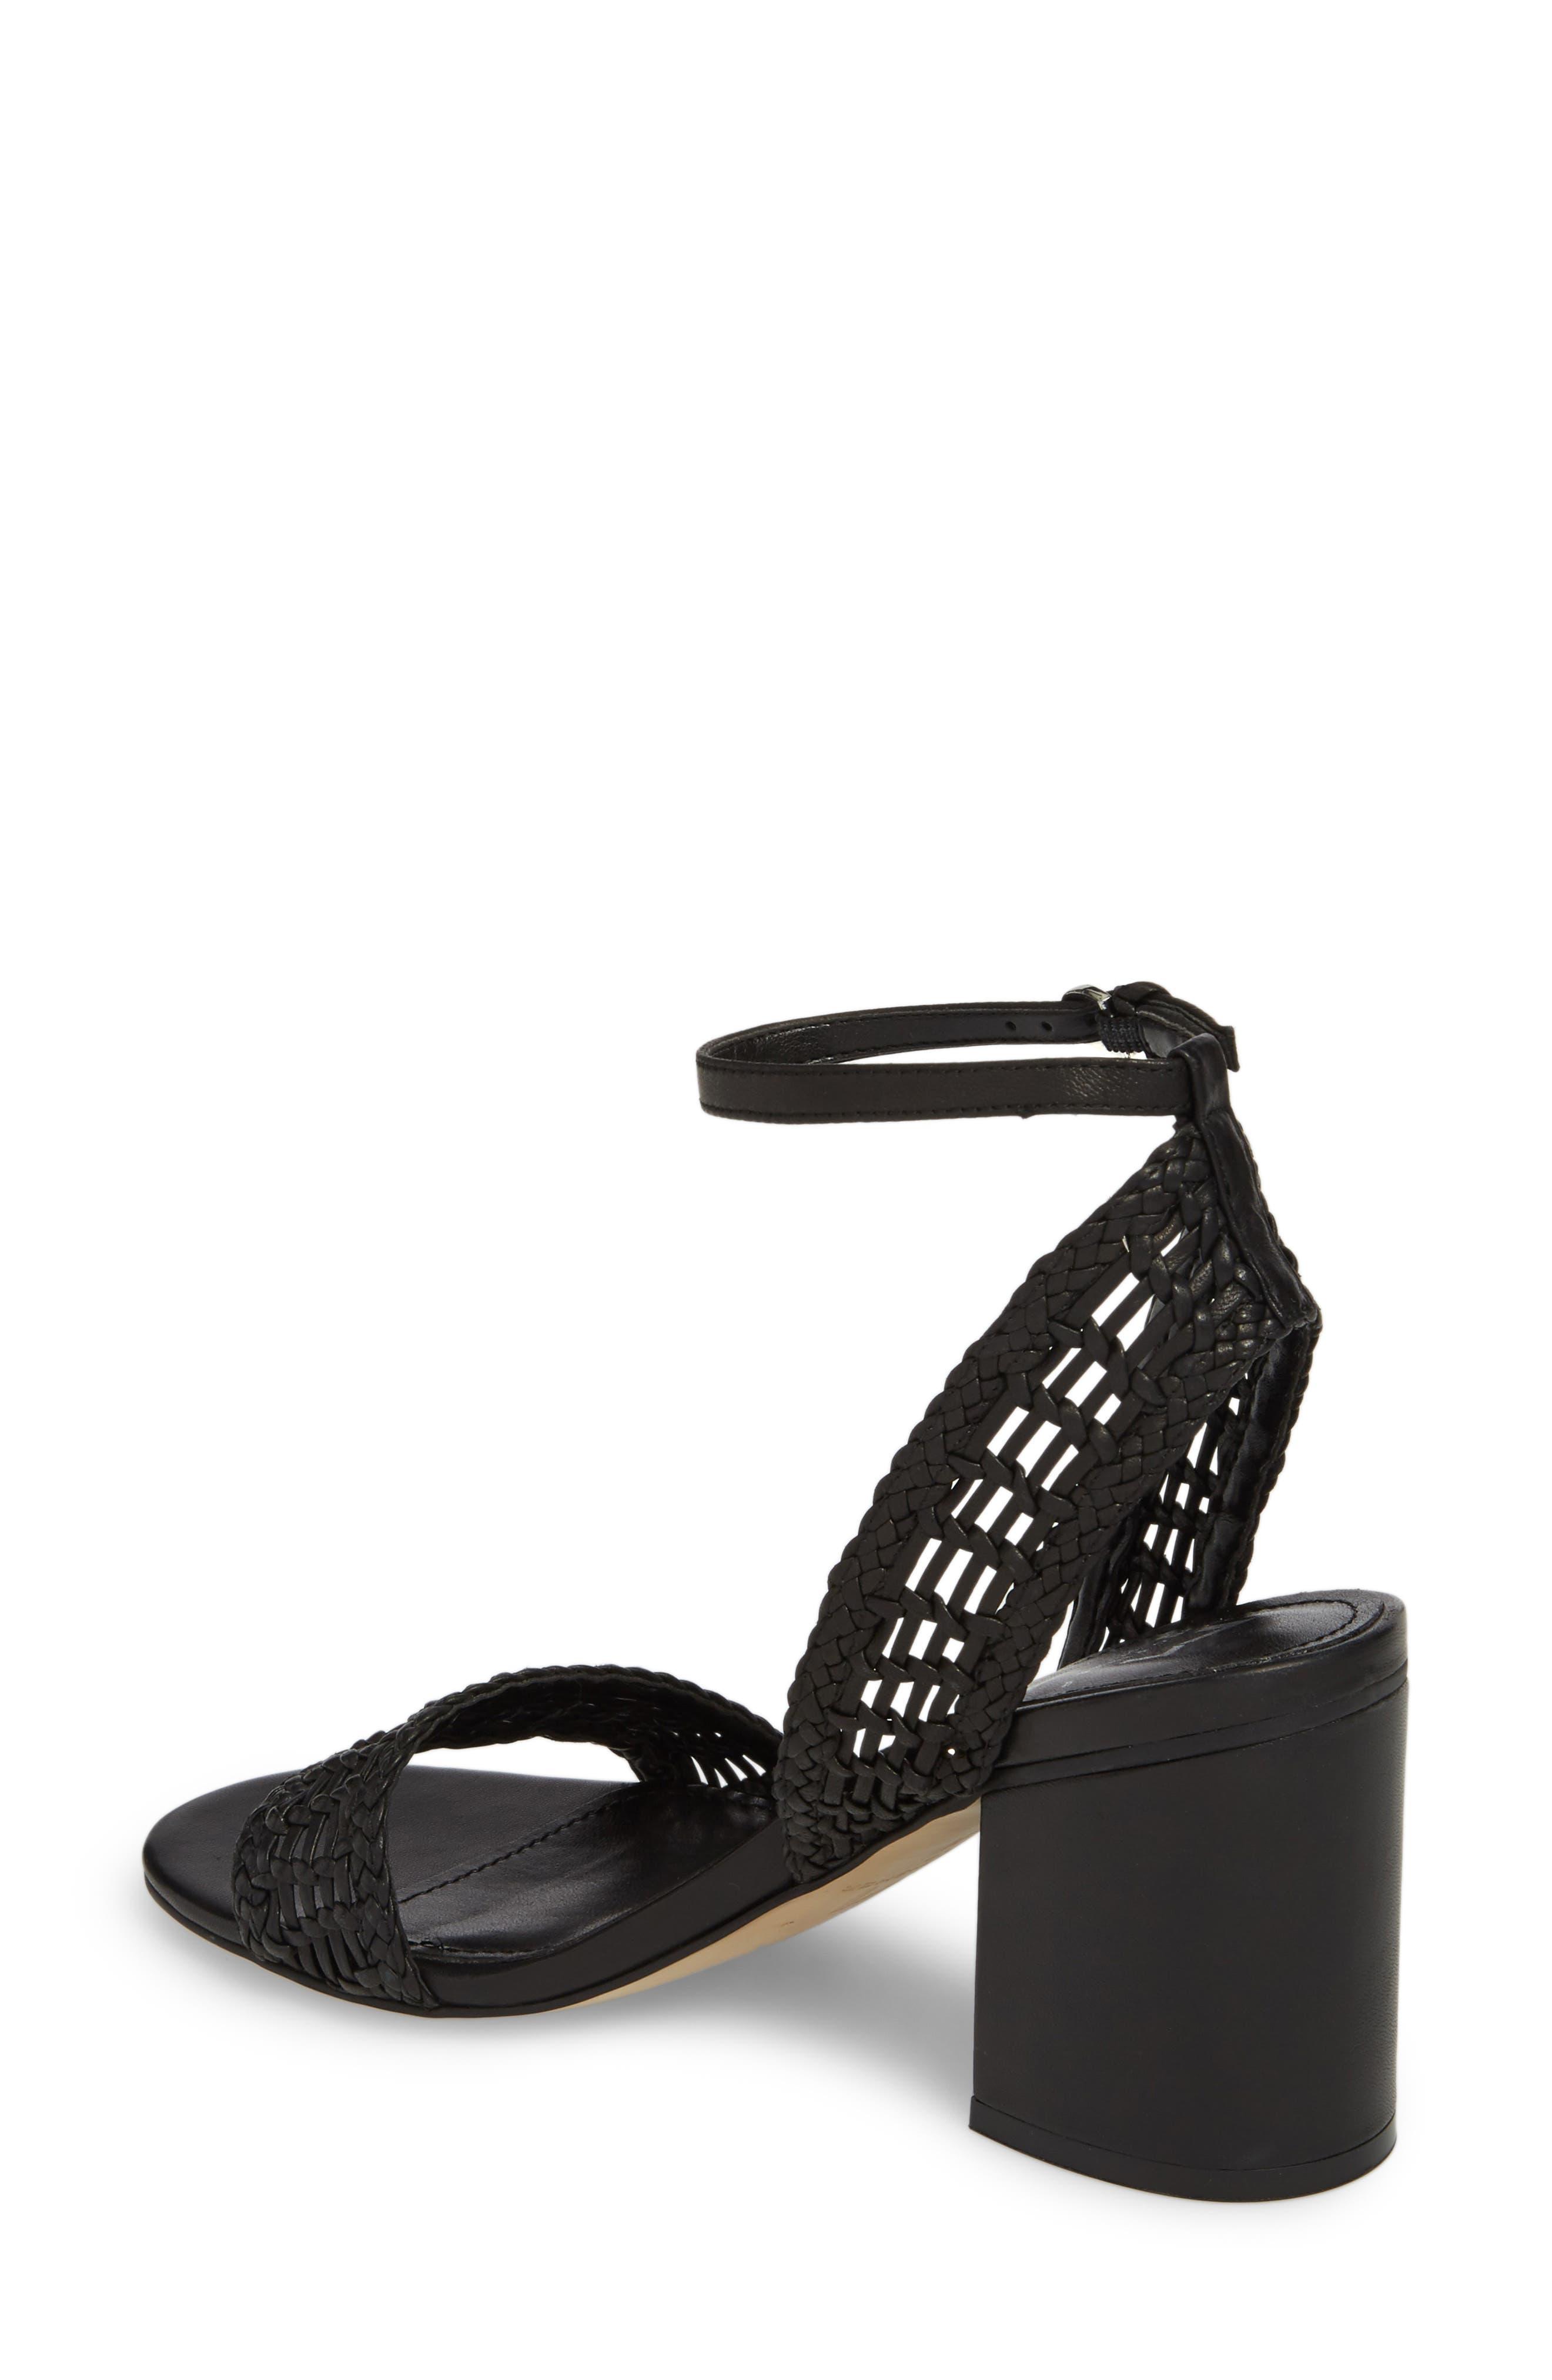 Amere Ankle Strap Sandal,                             Alternate thumbnail 2, color,                             Black Leather